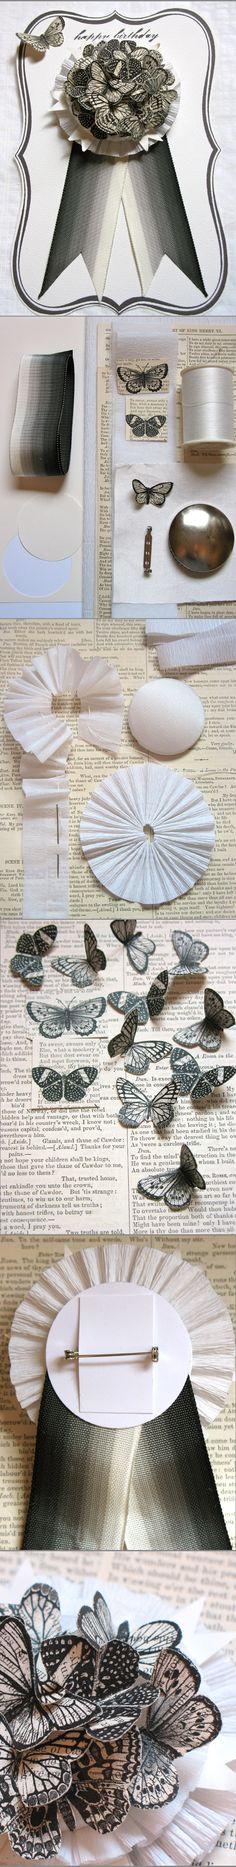 DIY: Butterfly Badge tutorial -- by Denise Sharp of Studio d.Sharp via Poppytalk http://poppytalk.blogspot.ca/2012/08/diy-butterfly-badge.html